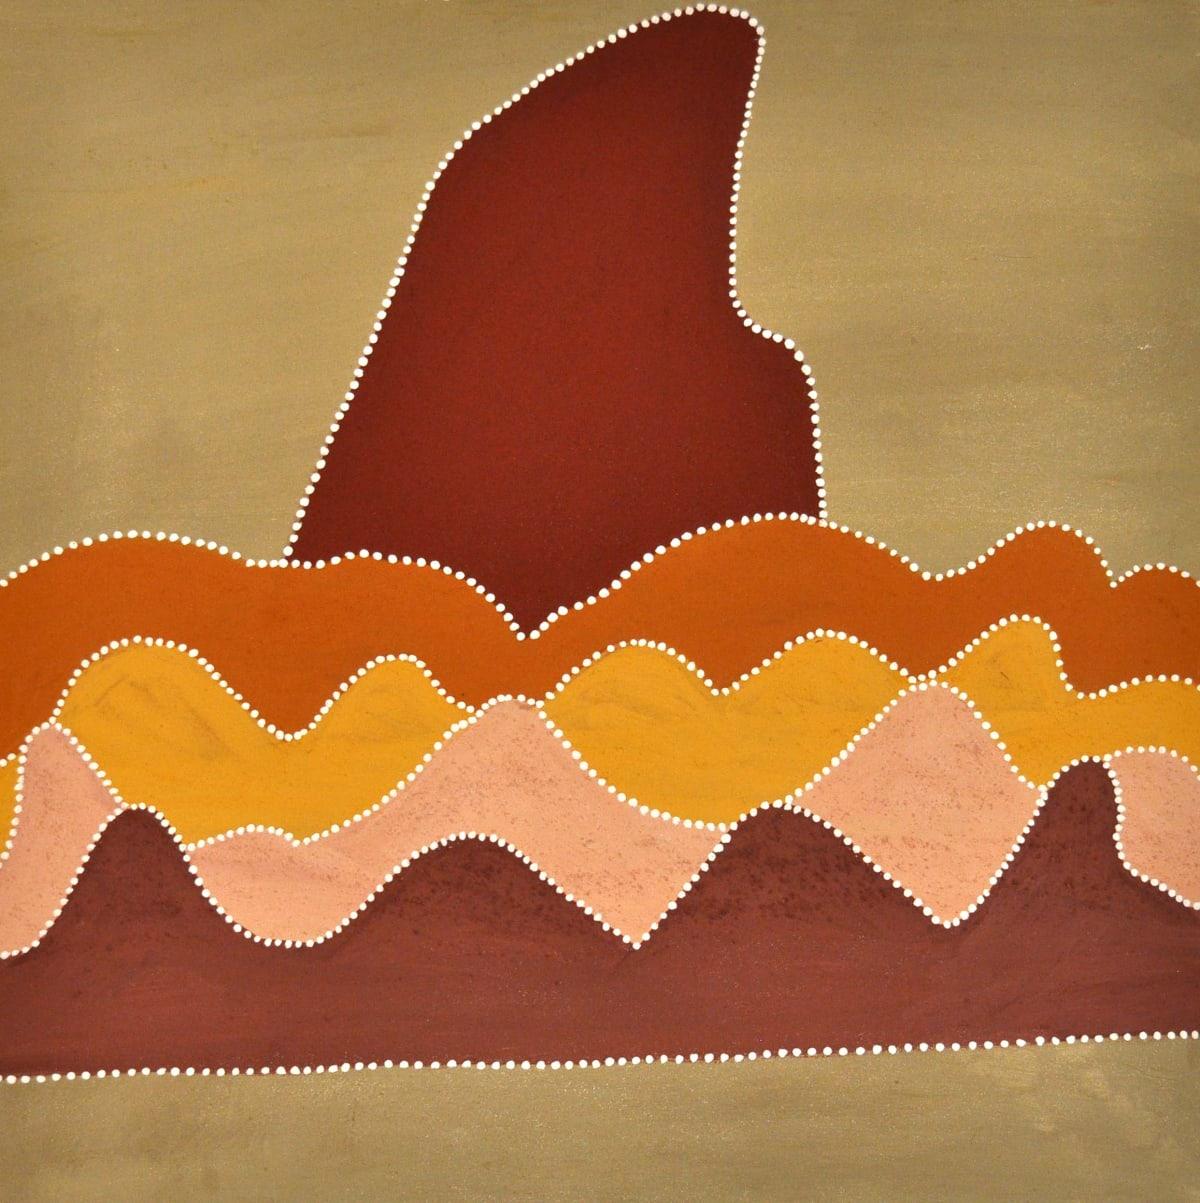 Betty Carrington Garlumbuny natural ochre and pigments on canvas 80 x 80 cm